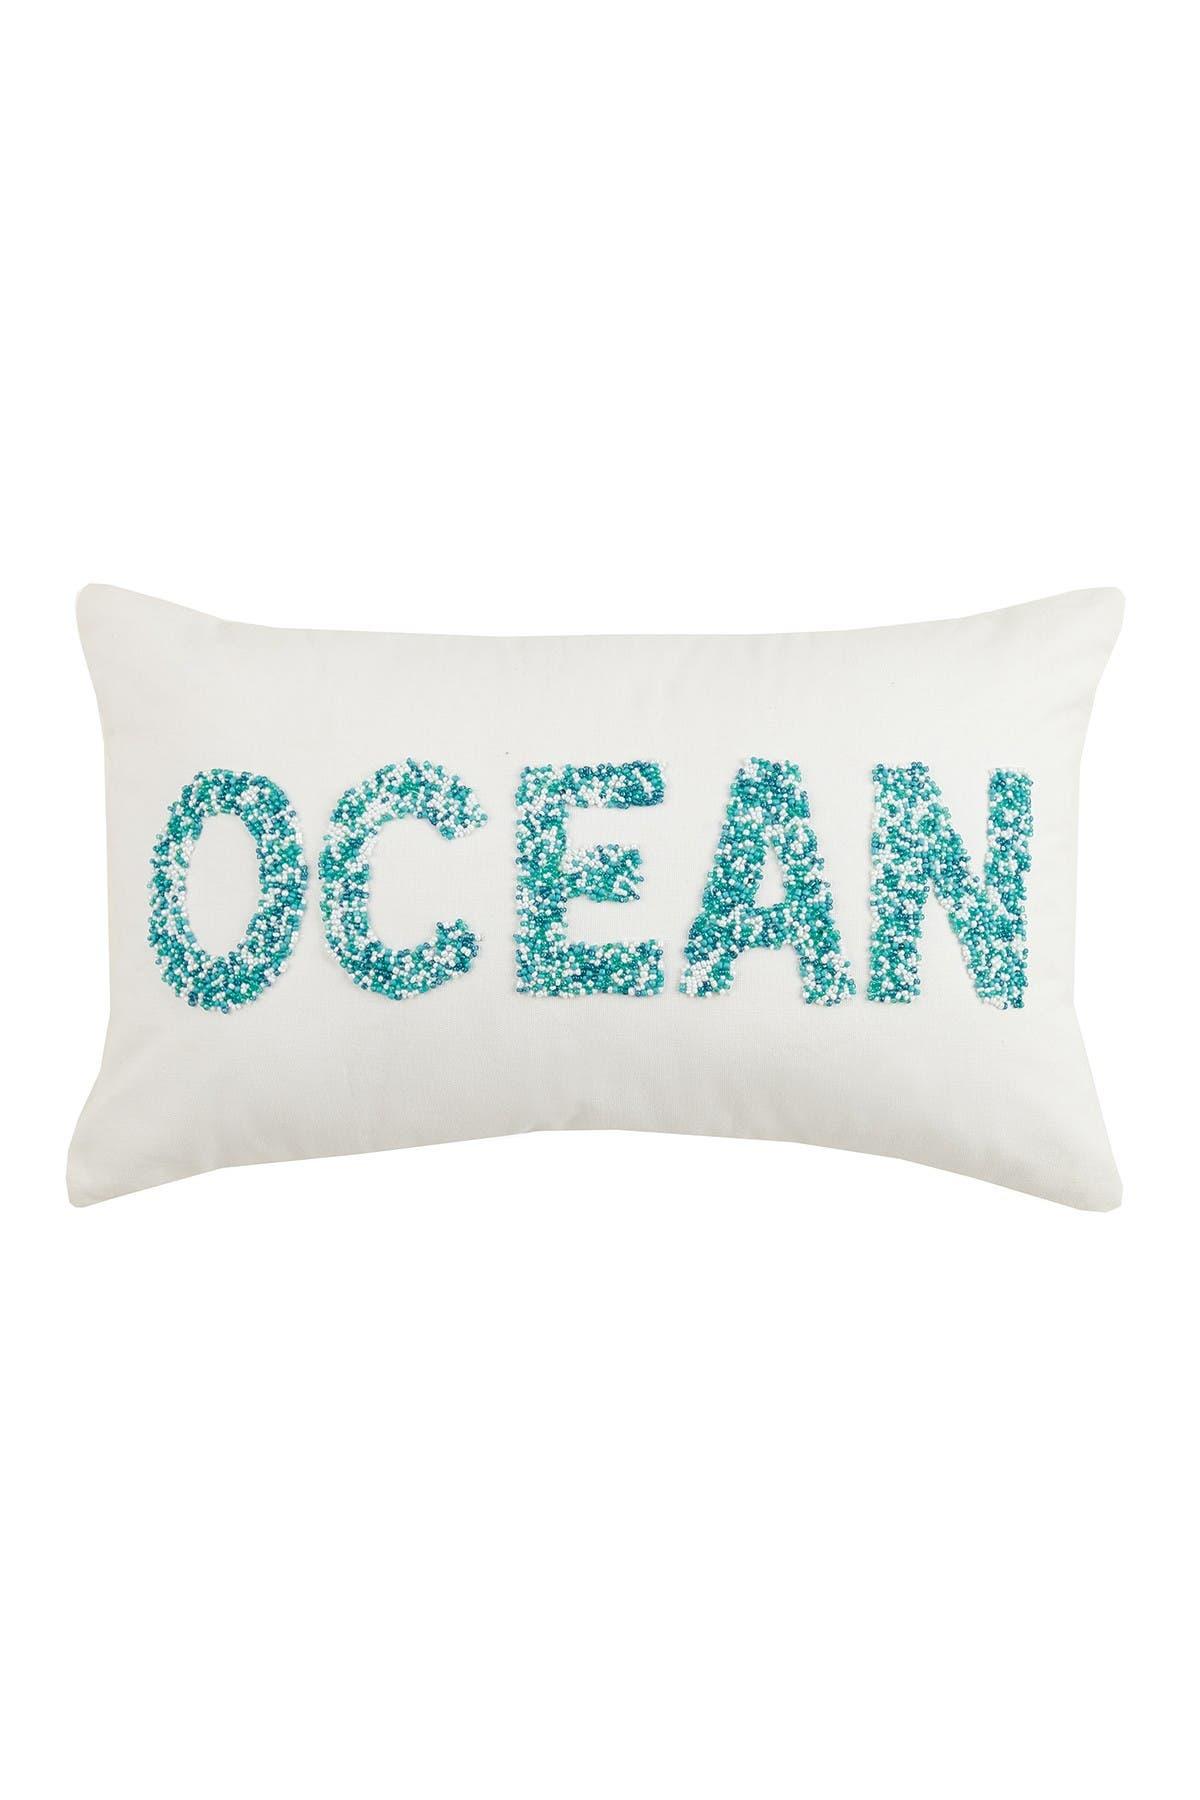 "Image of Peking Handicraft Ocean Beaded Pillow - 12"" x 20"" - Blue/White"